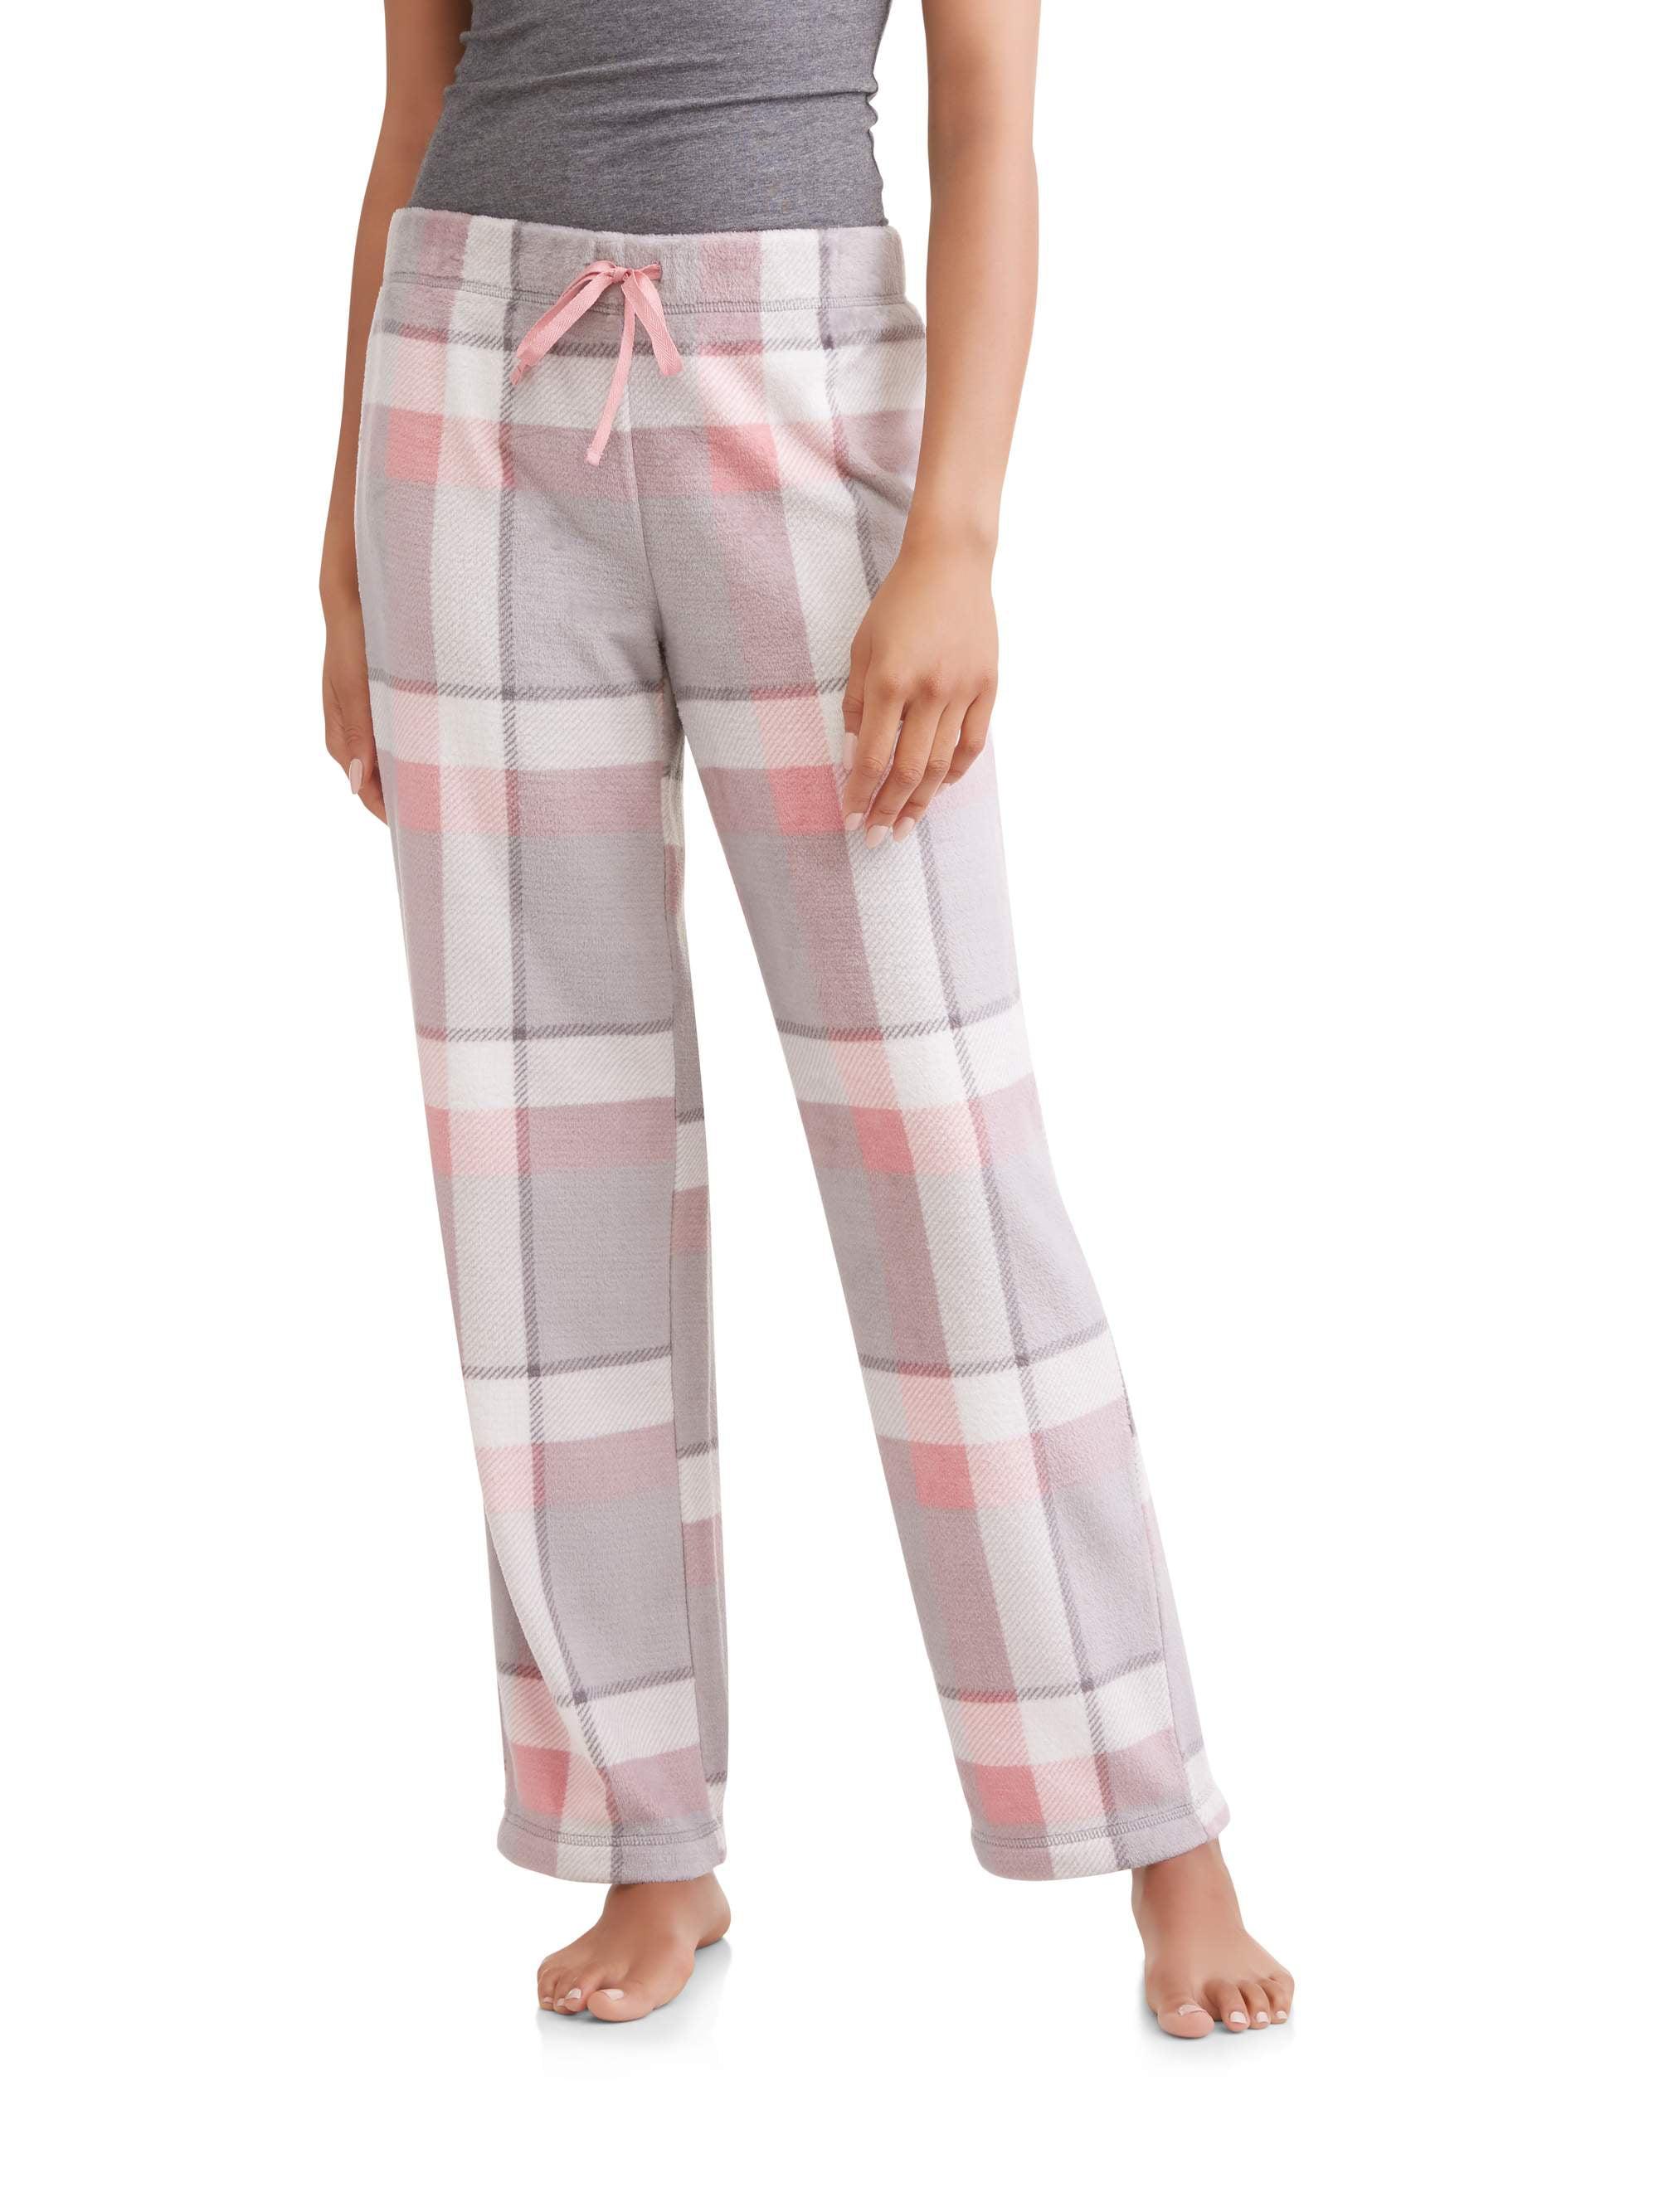 Secret Treasures Women's and Women's Plus Superminky Sleep Pants